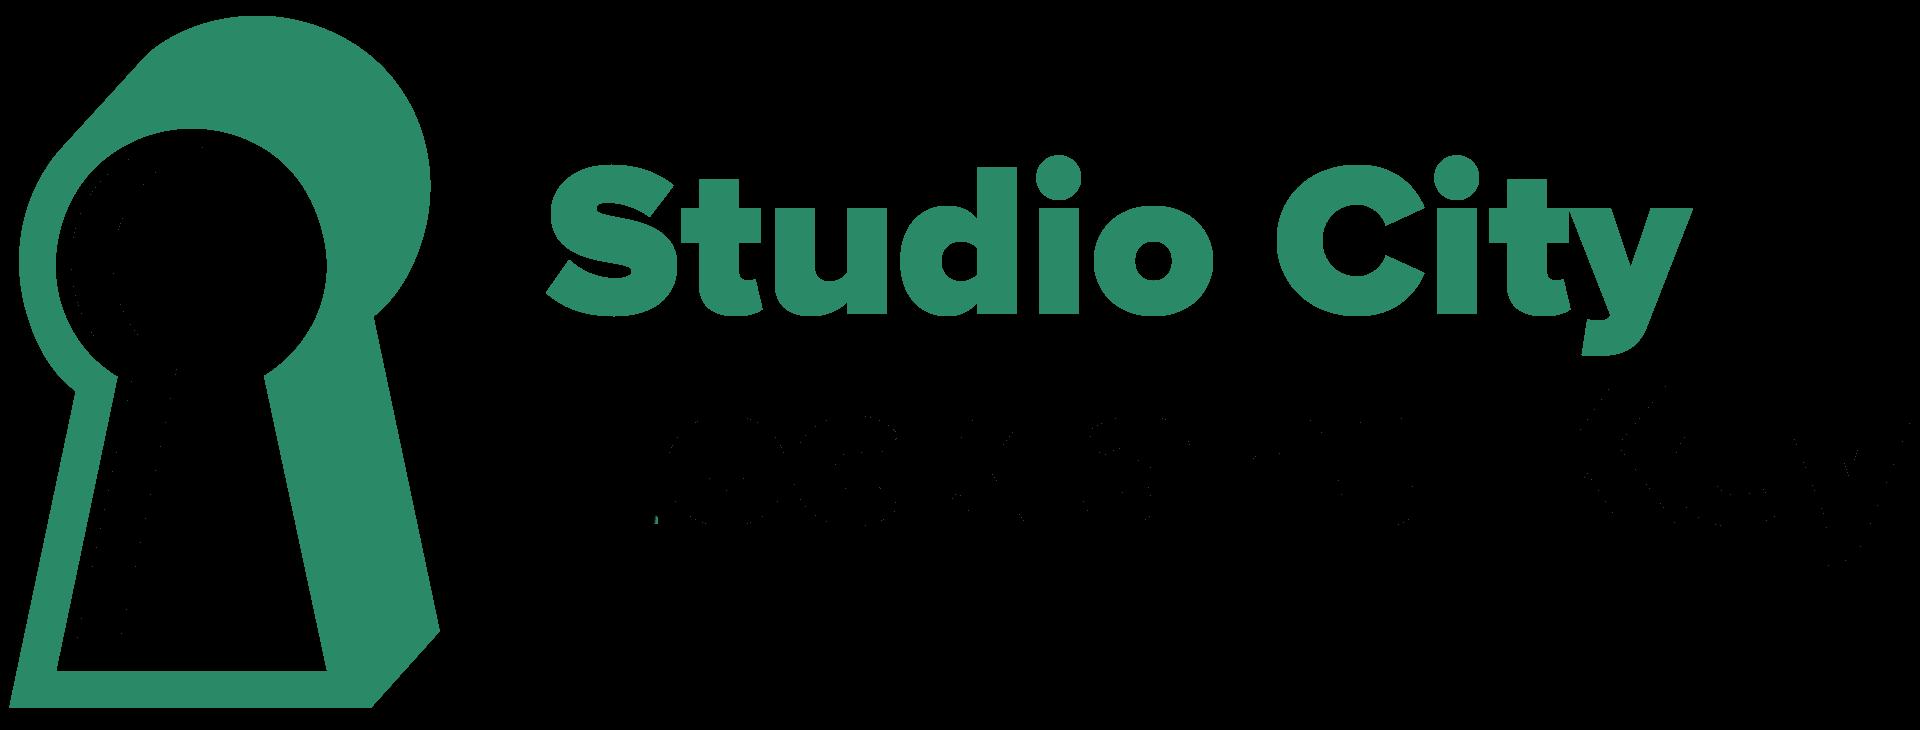 Studio City Lock and Key